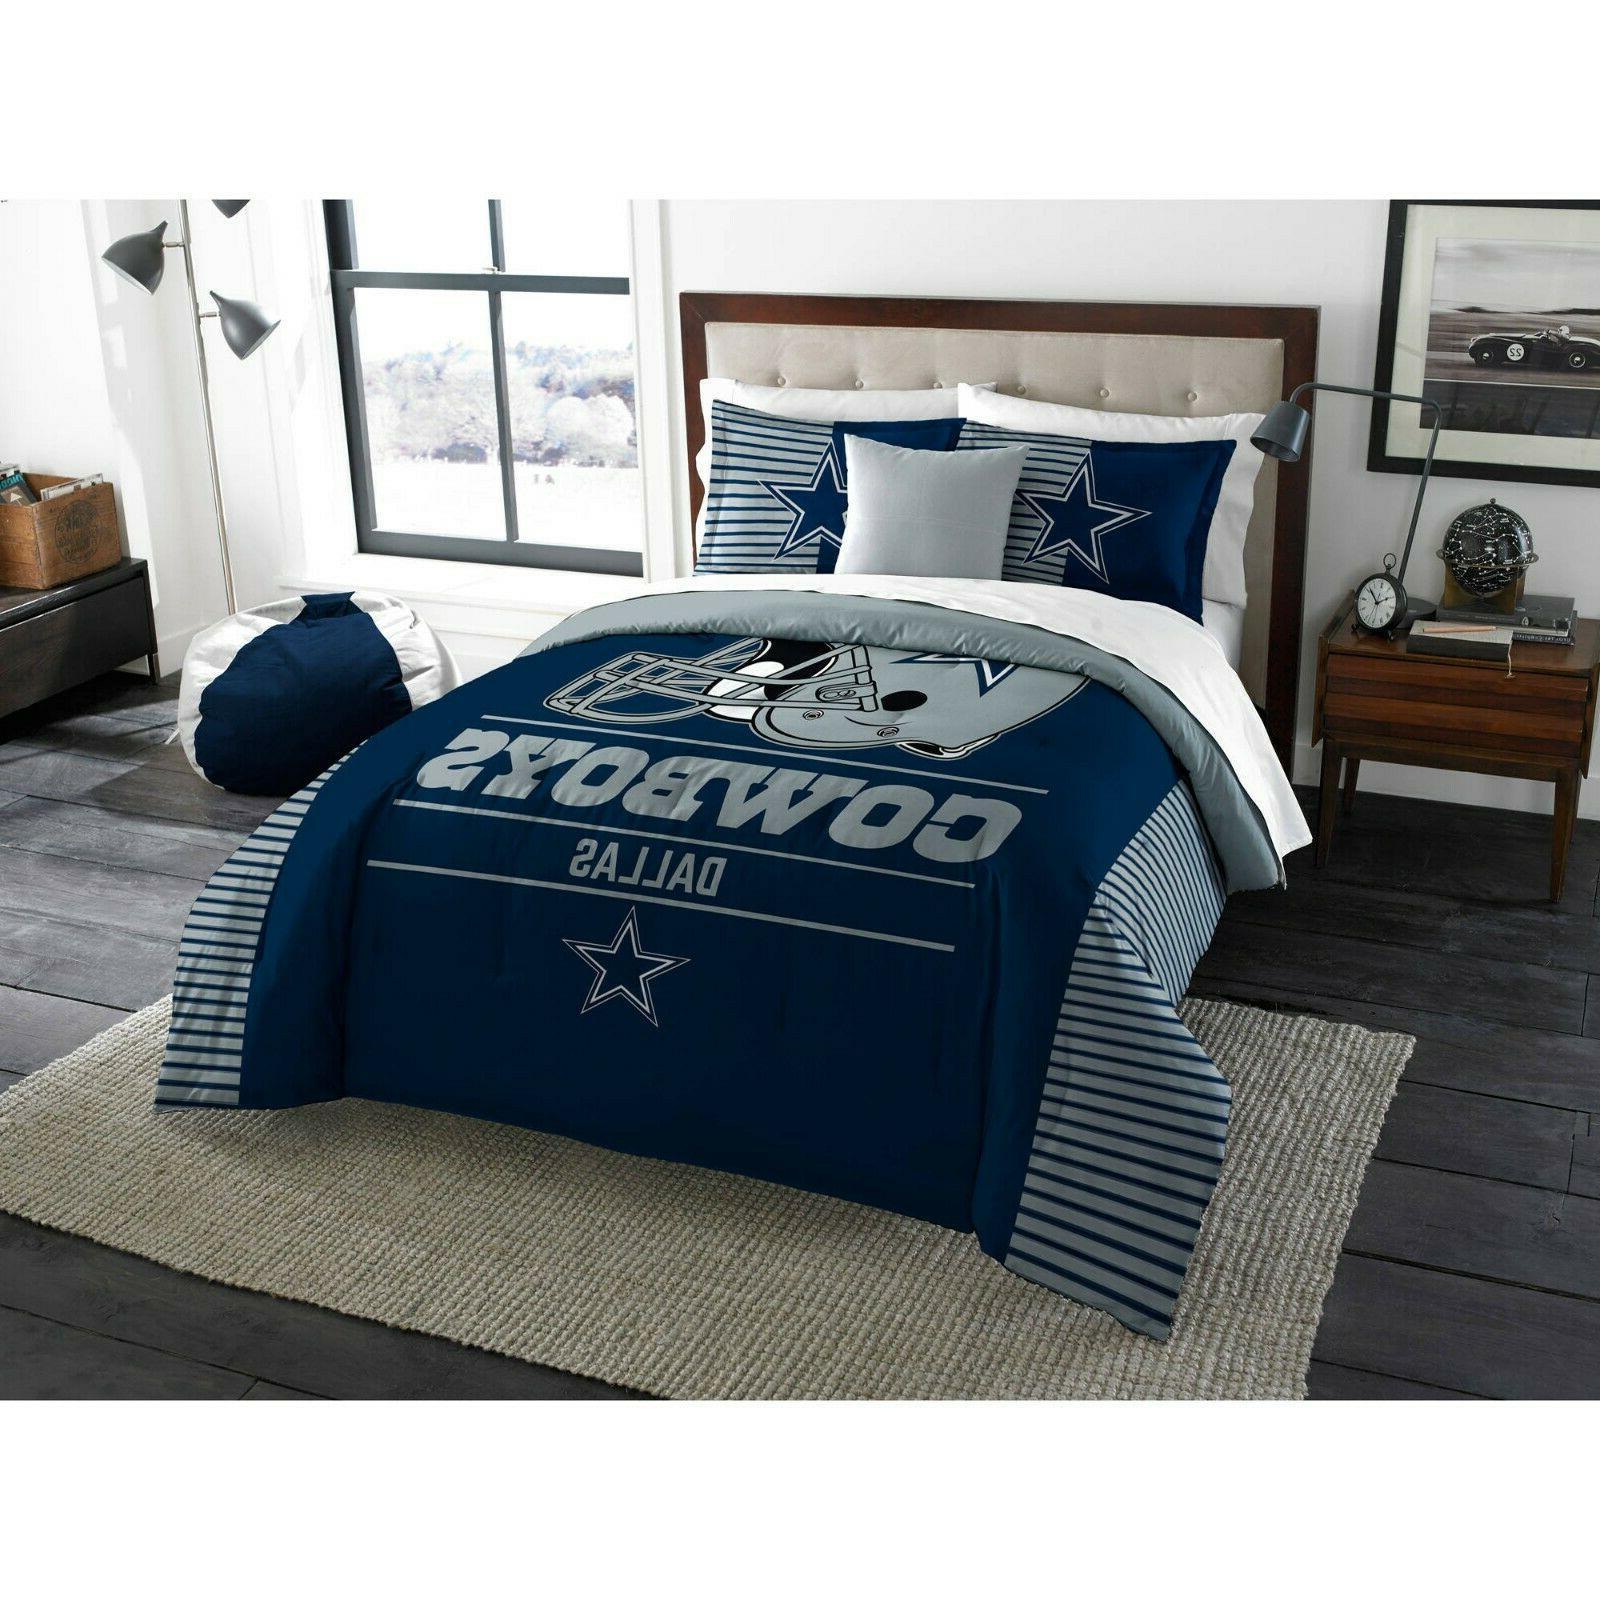 new dallas cowboys comforter 3 pc set